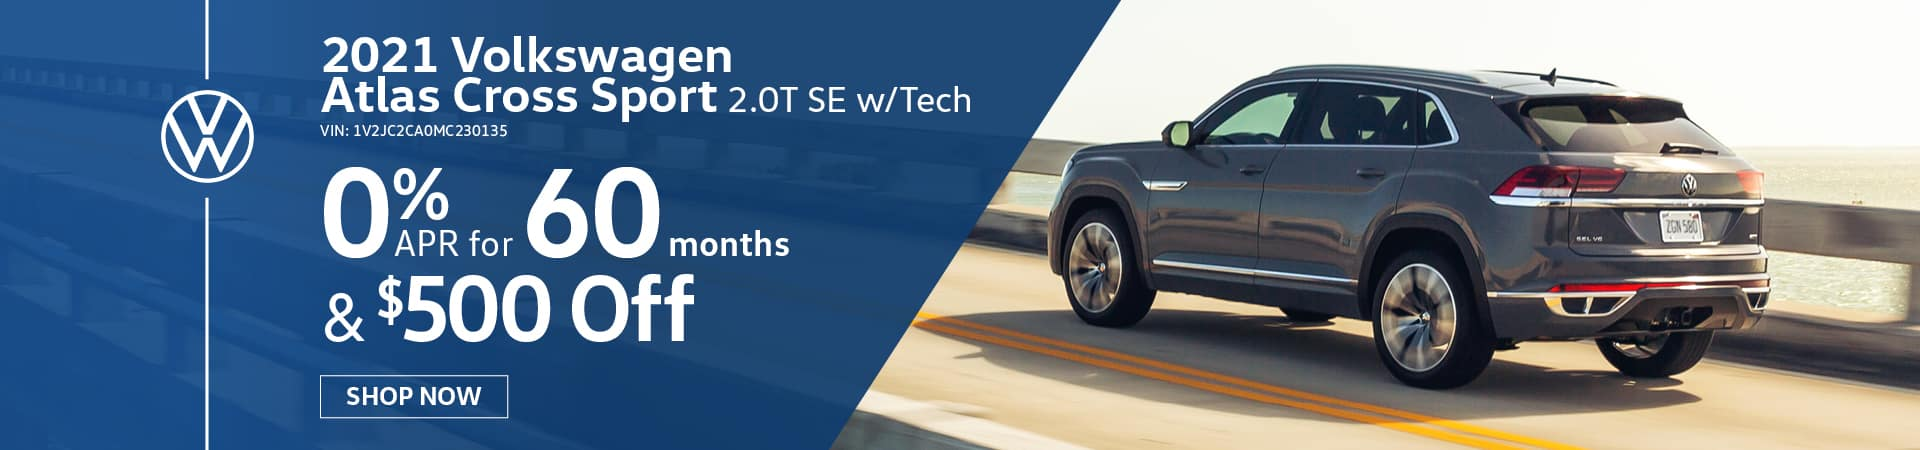 Volkswagen-Mobile-2021-06-Homepage-Banners3